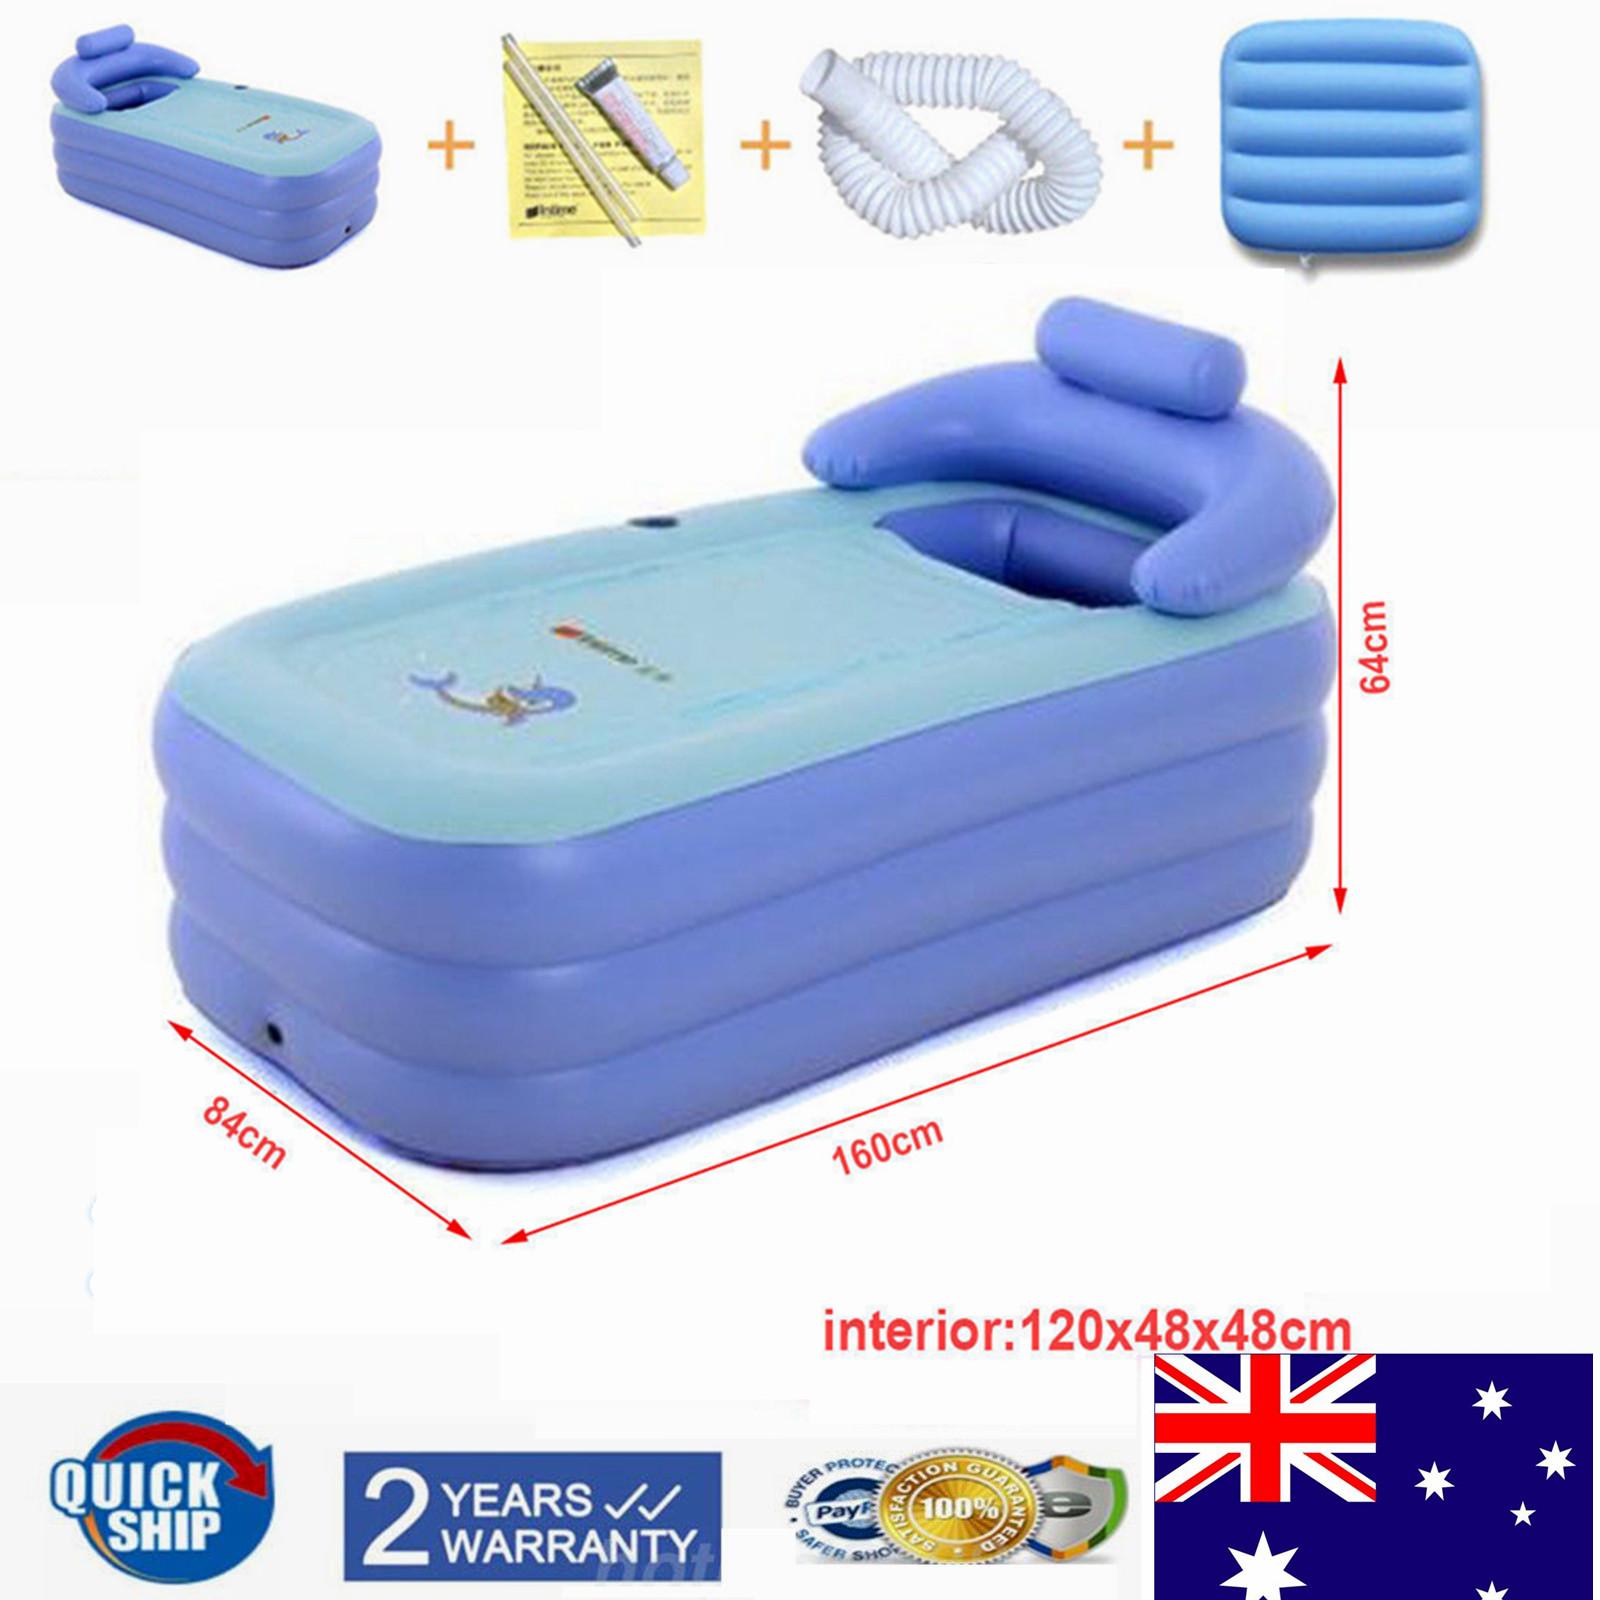 Foldable Inflatable Blowup Bathtub Adult PVC Bath Tub Home Spa ...